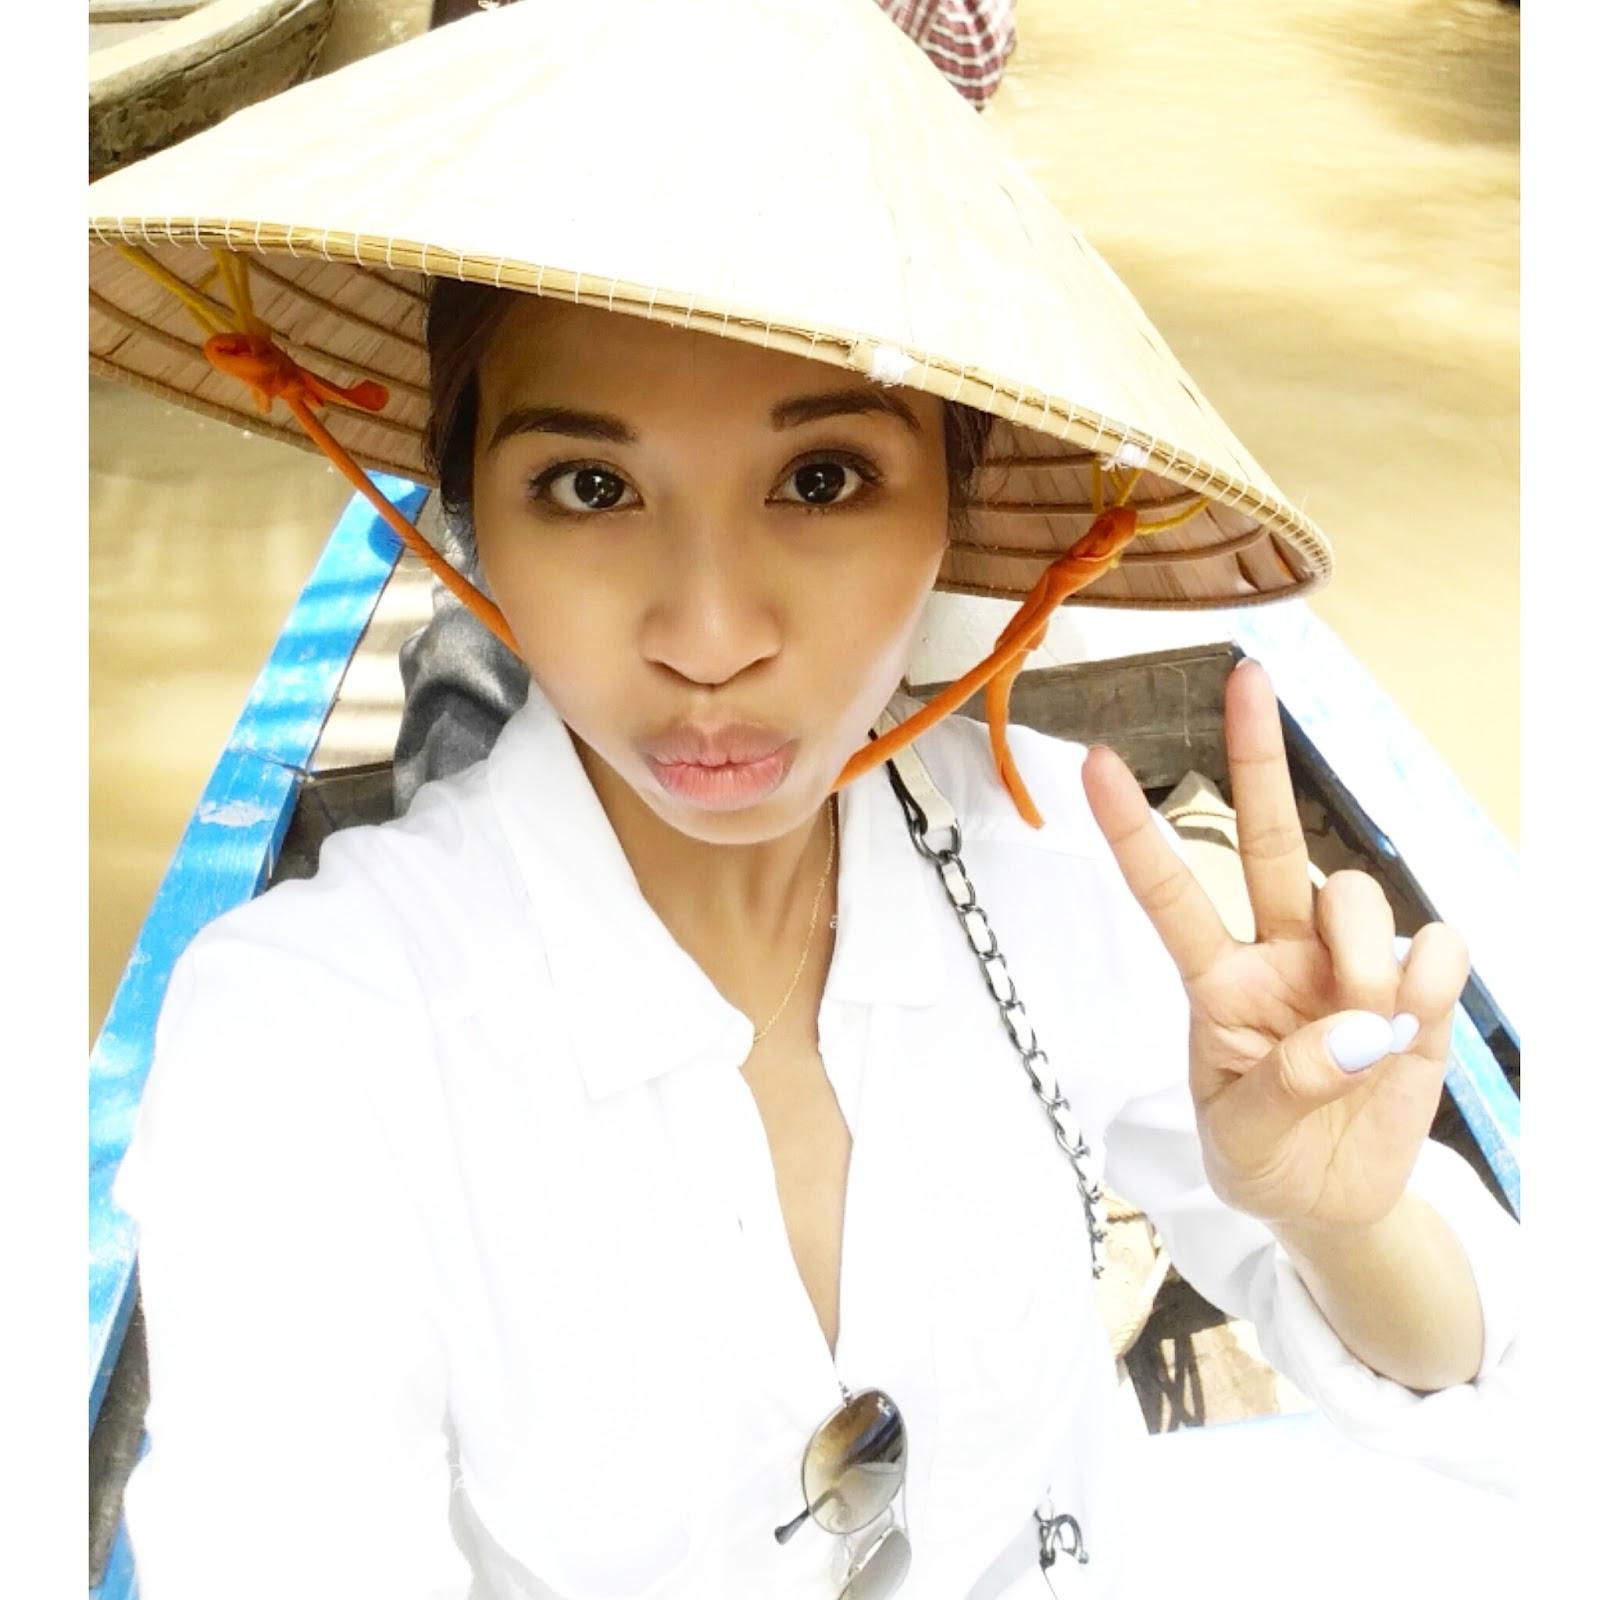 thetastefulme travels to Mekong Delta Vietnam 2015